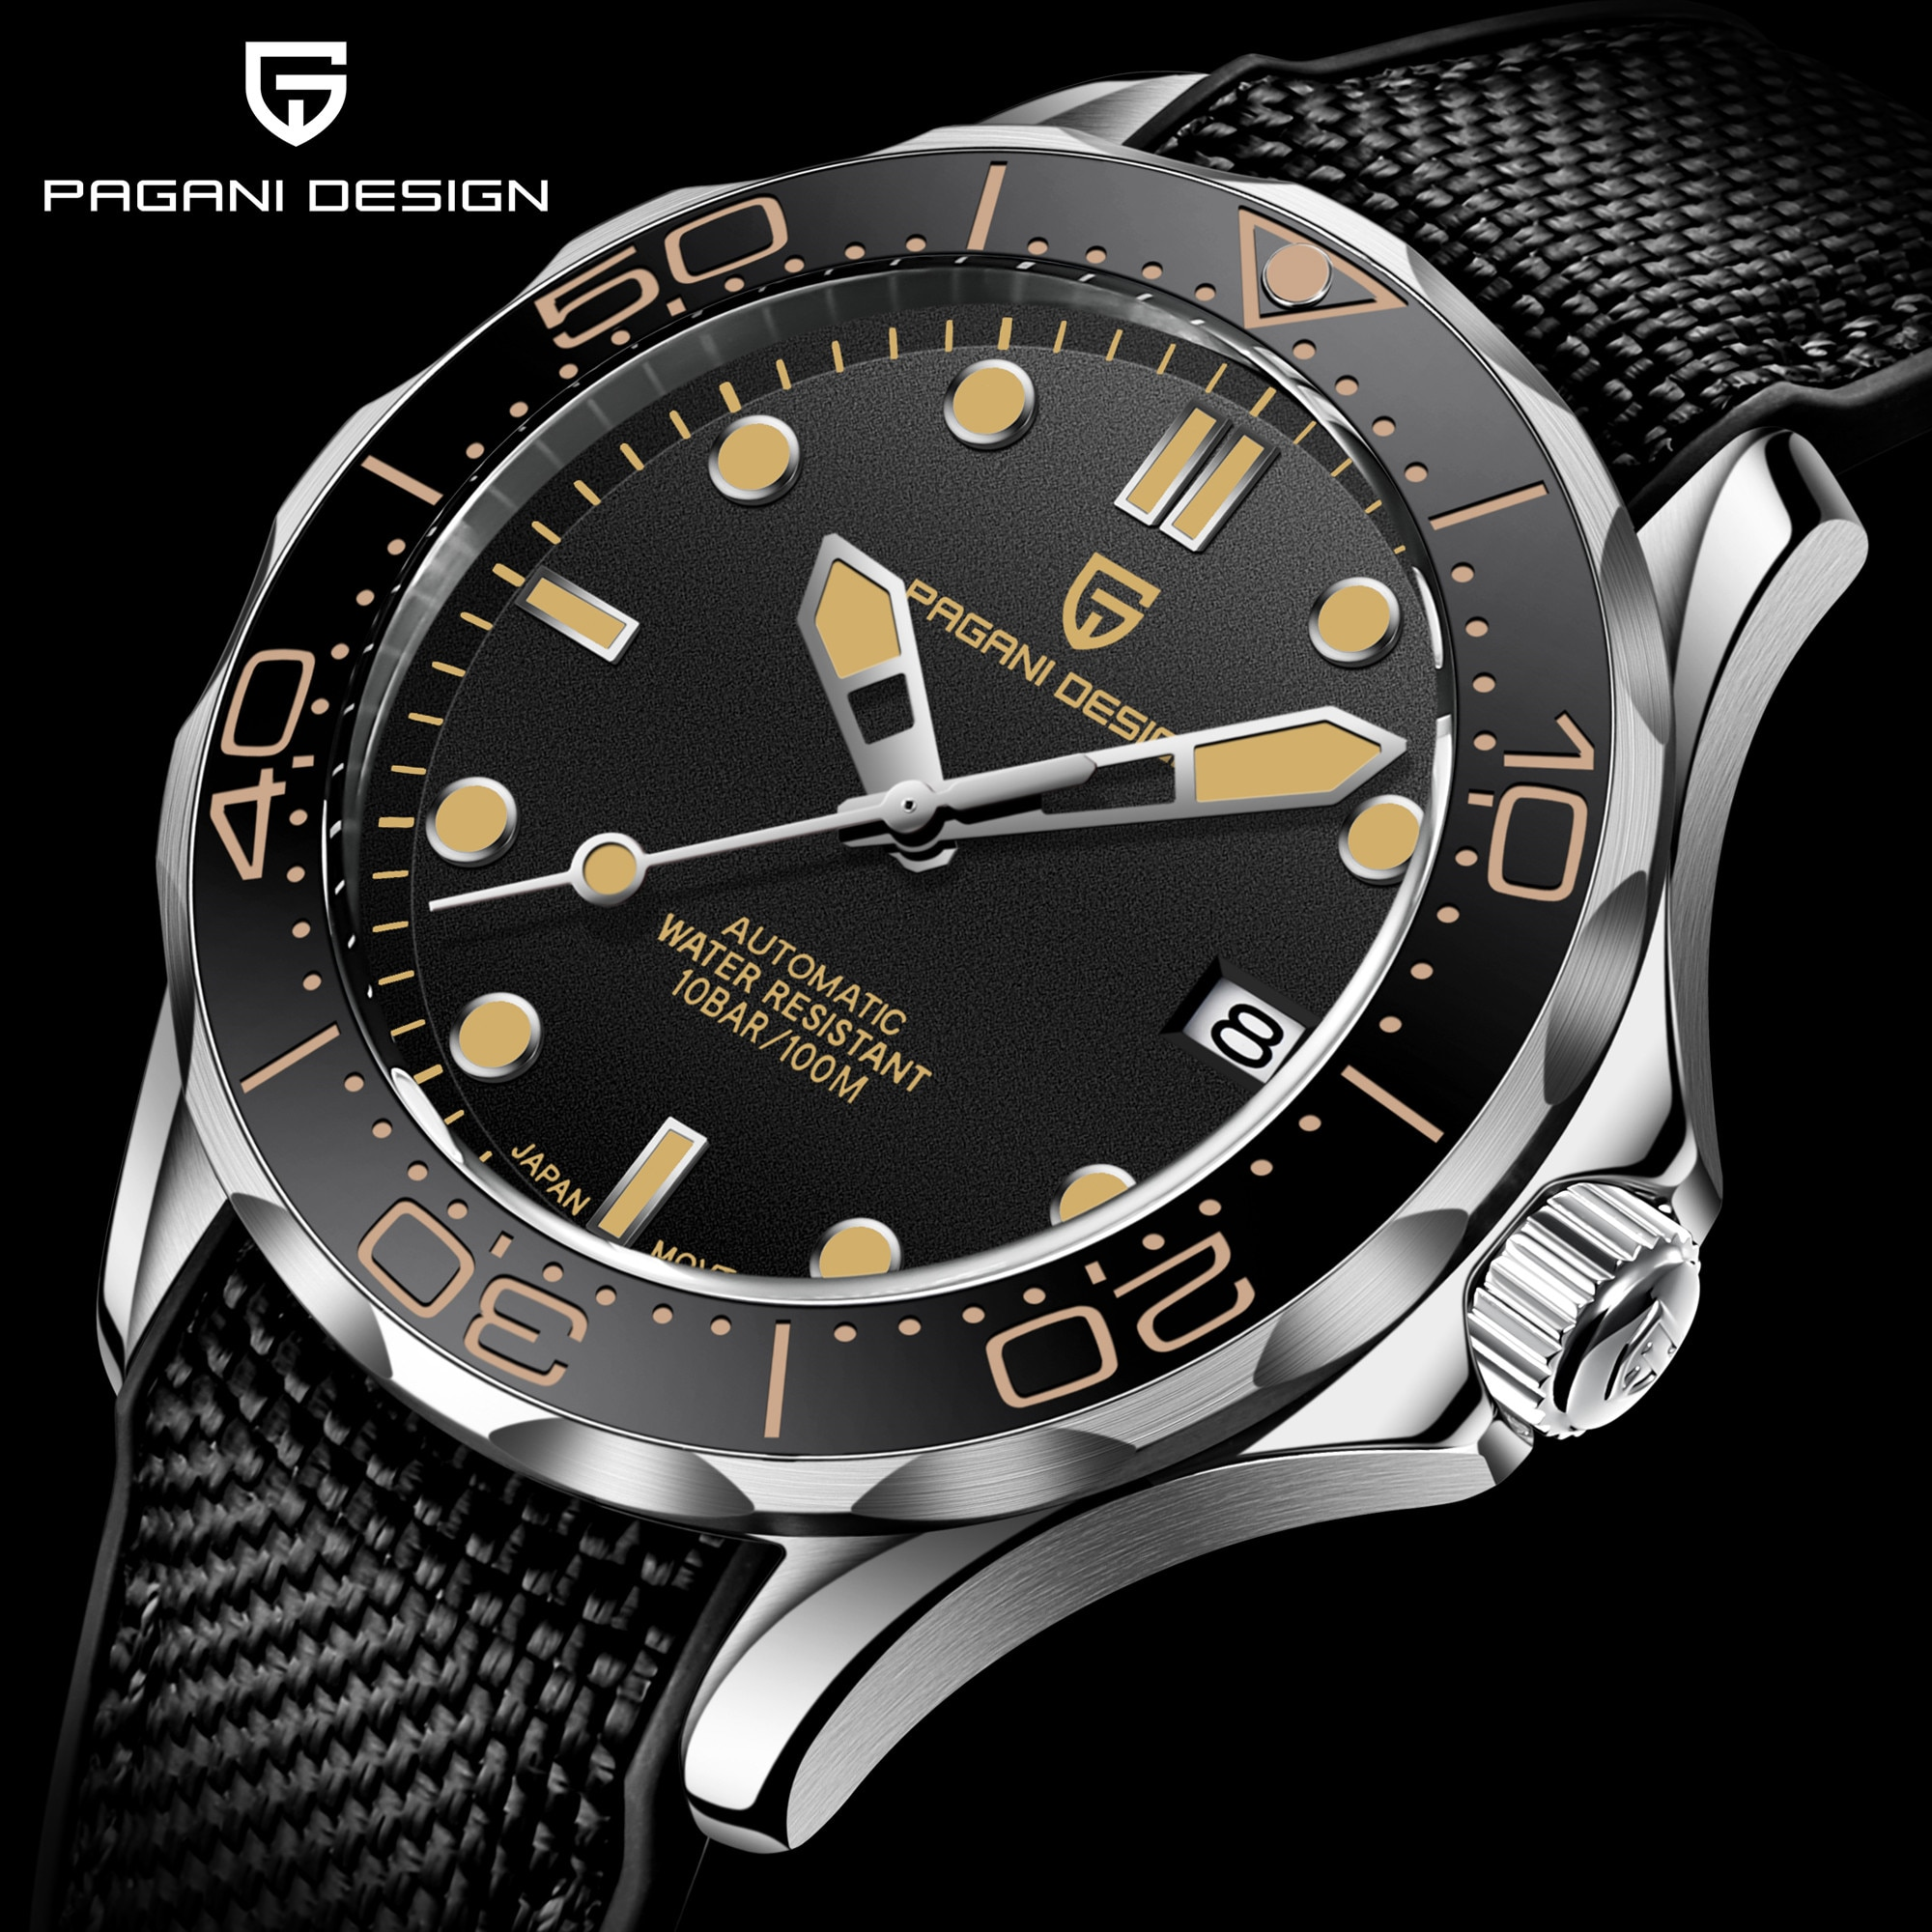 2021 New PAGANI DESIGN Men's Mechanical Watch Men Automatic Luxury Waterproof Sapphire Glass Leather